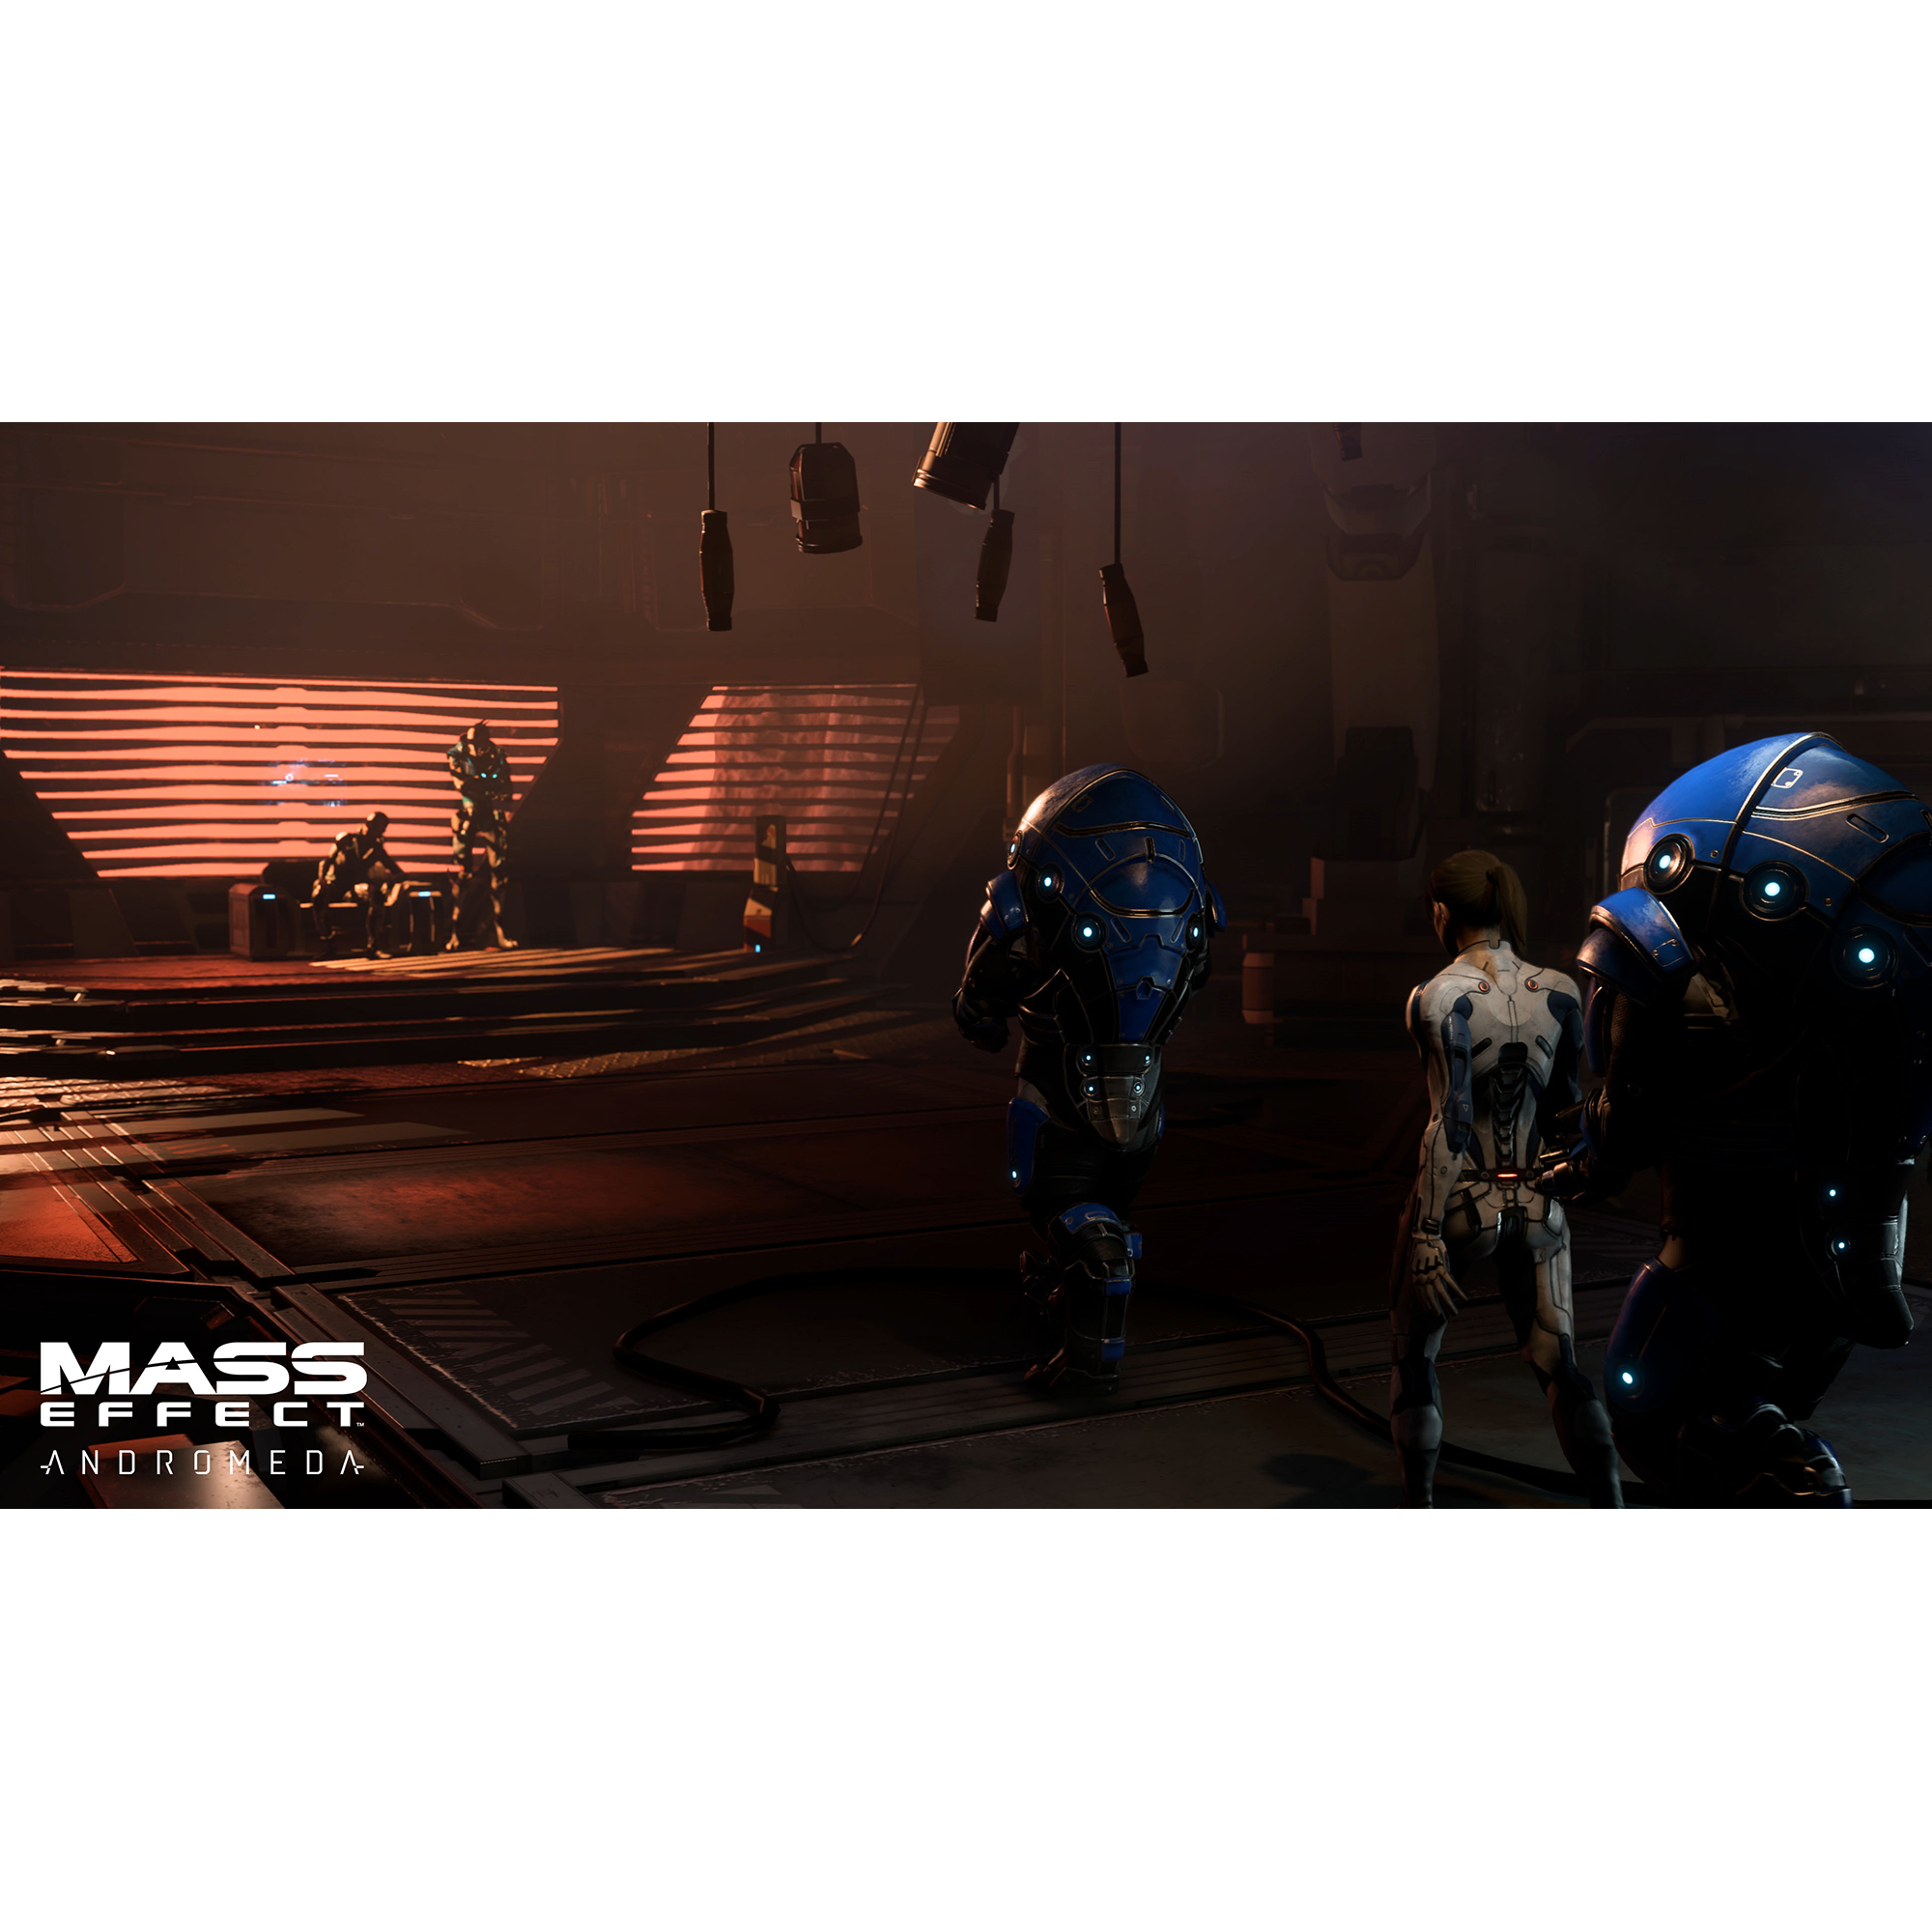 Joc Mass Effect: Andromeda pentru Xbox One 10